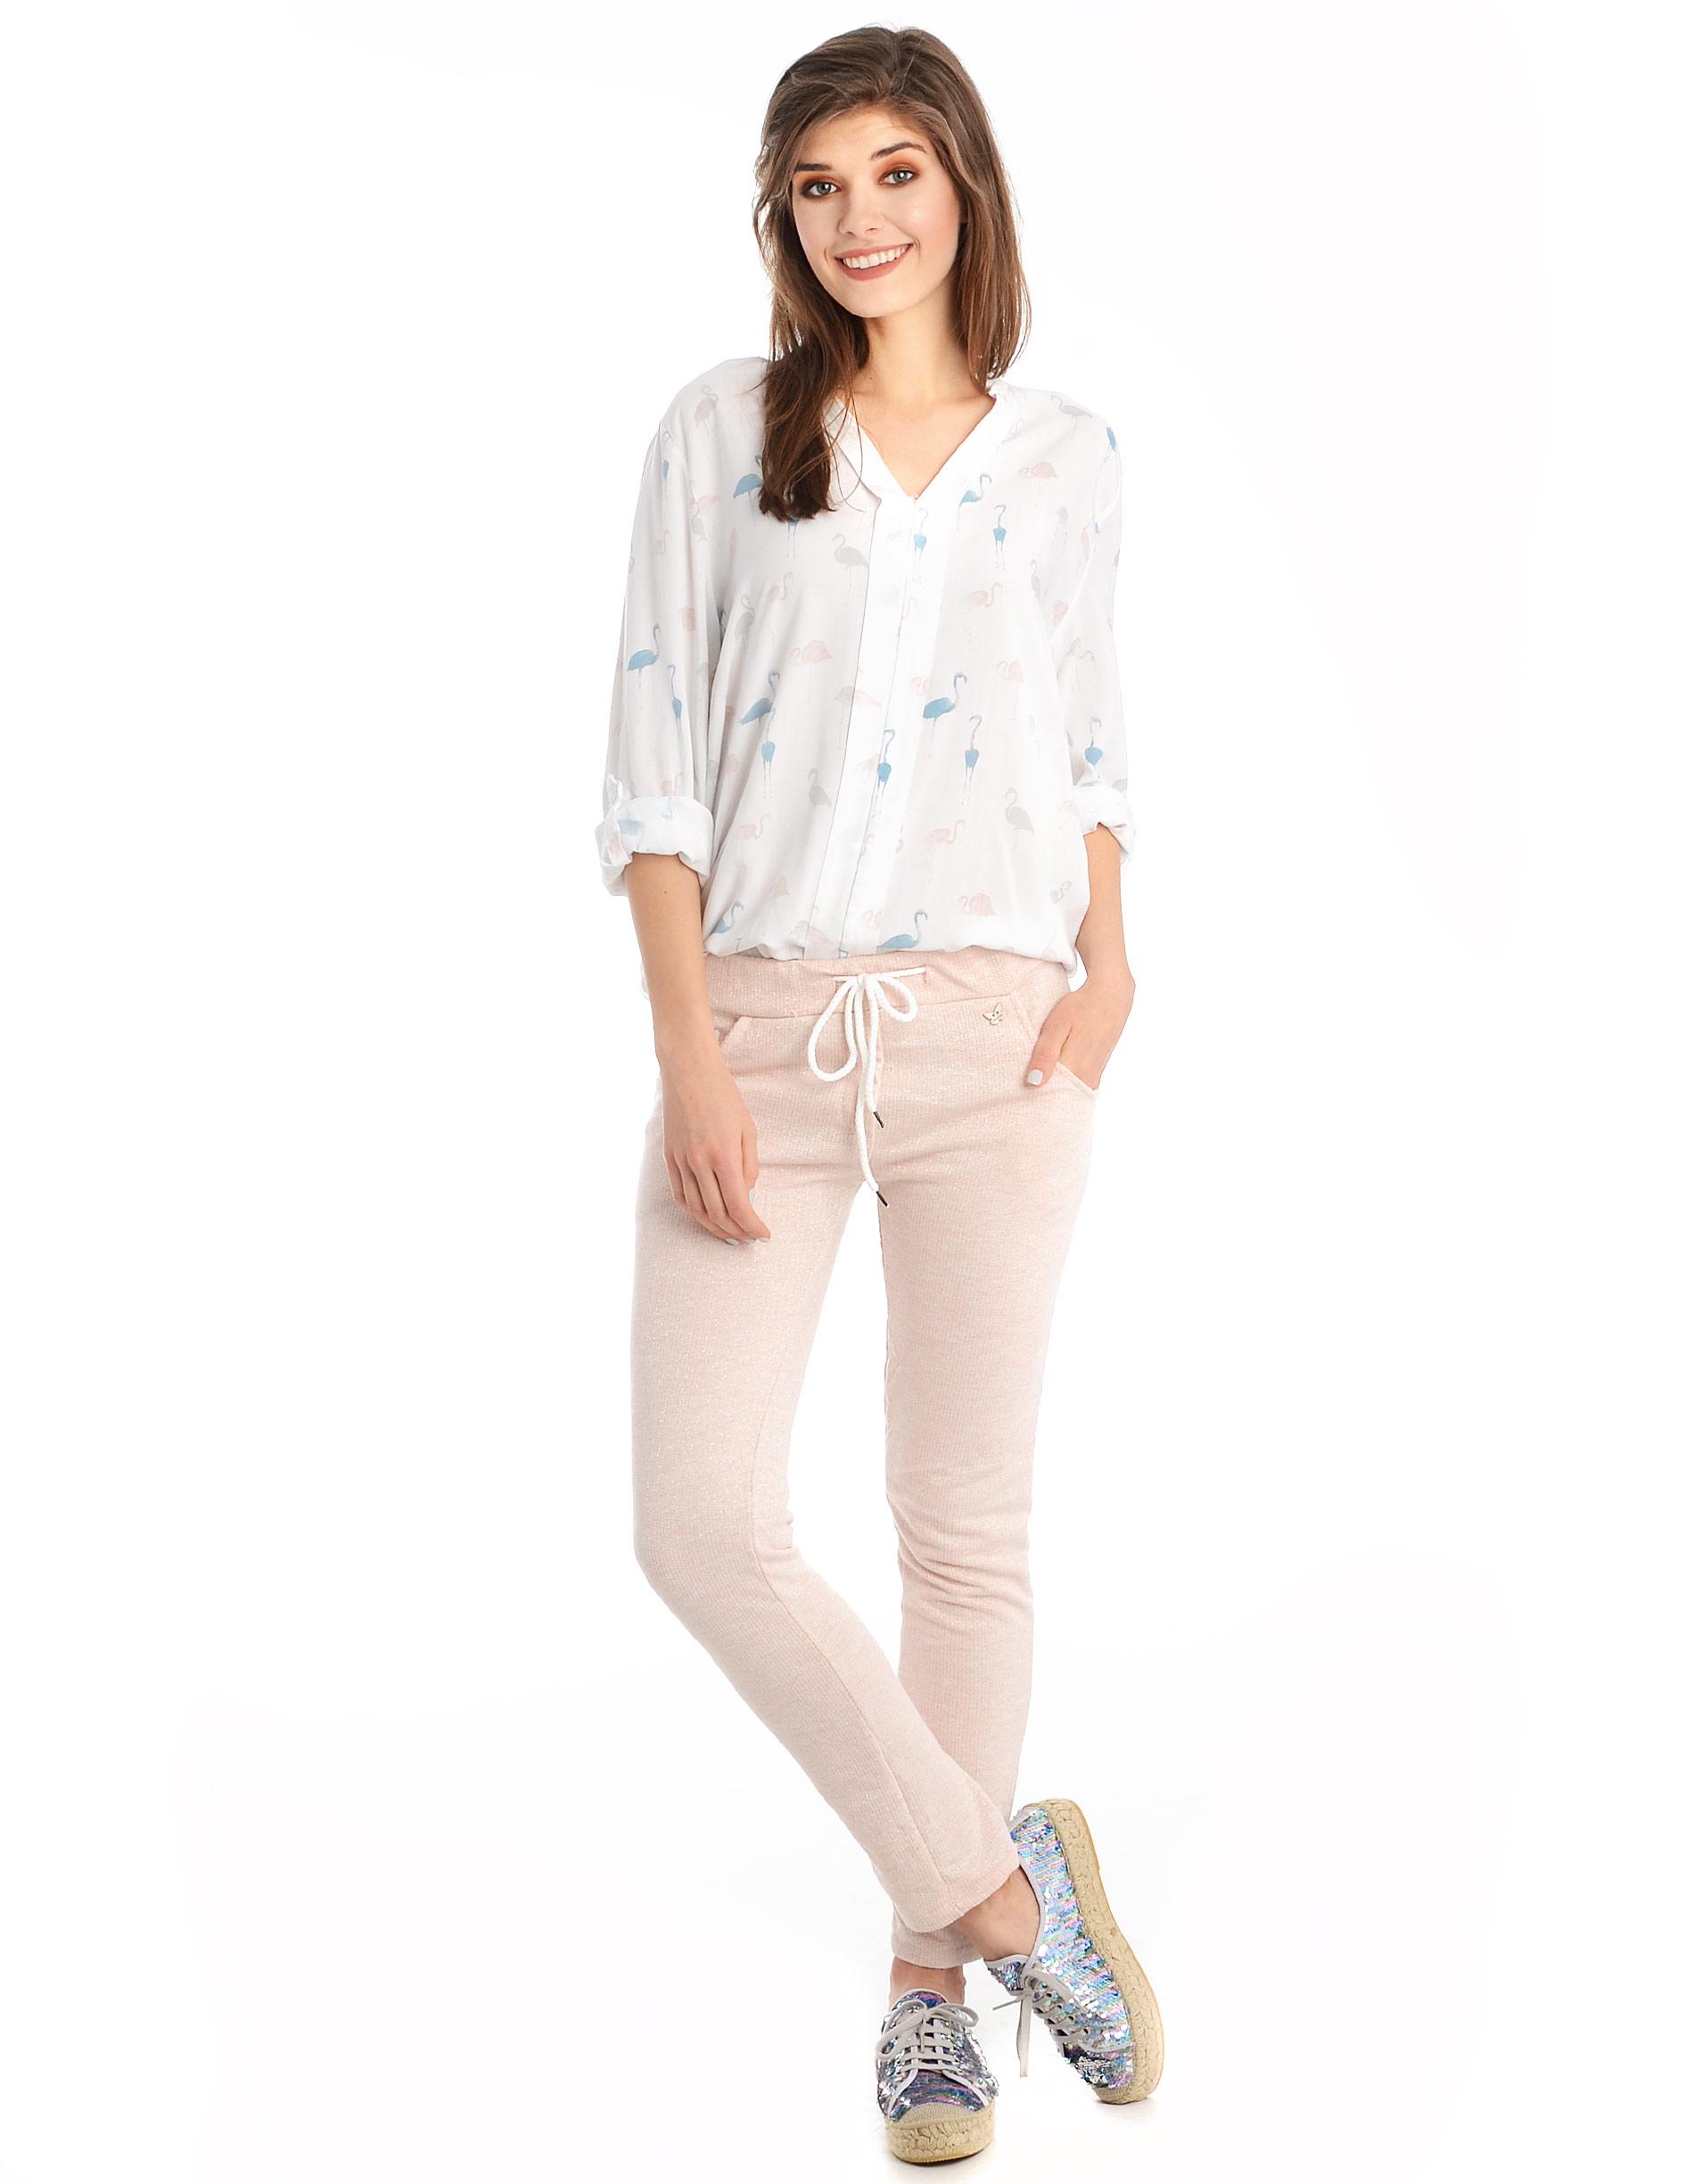 Spodnie - 104-7229 ROSA - Unisono